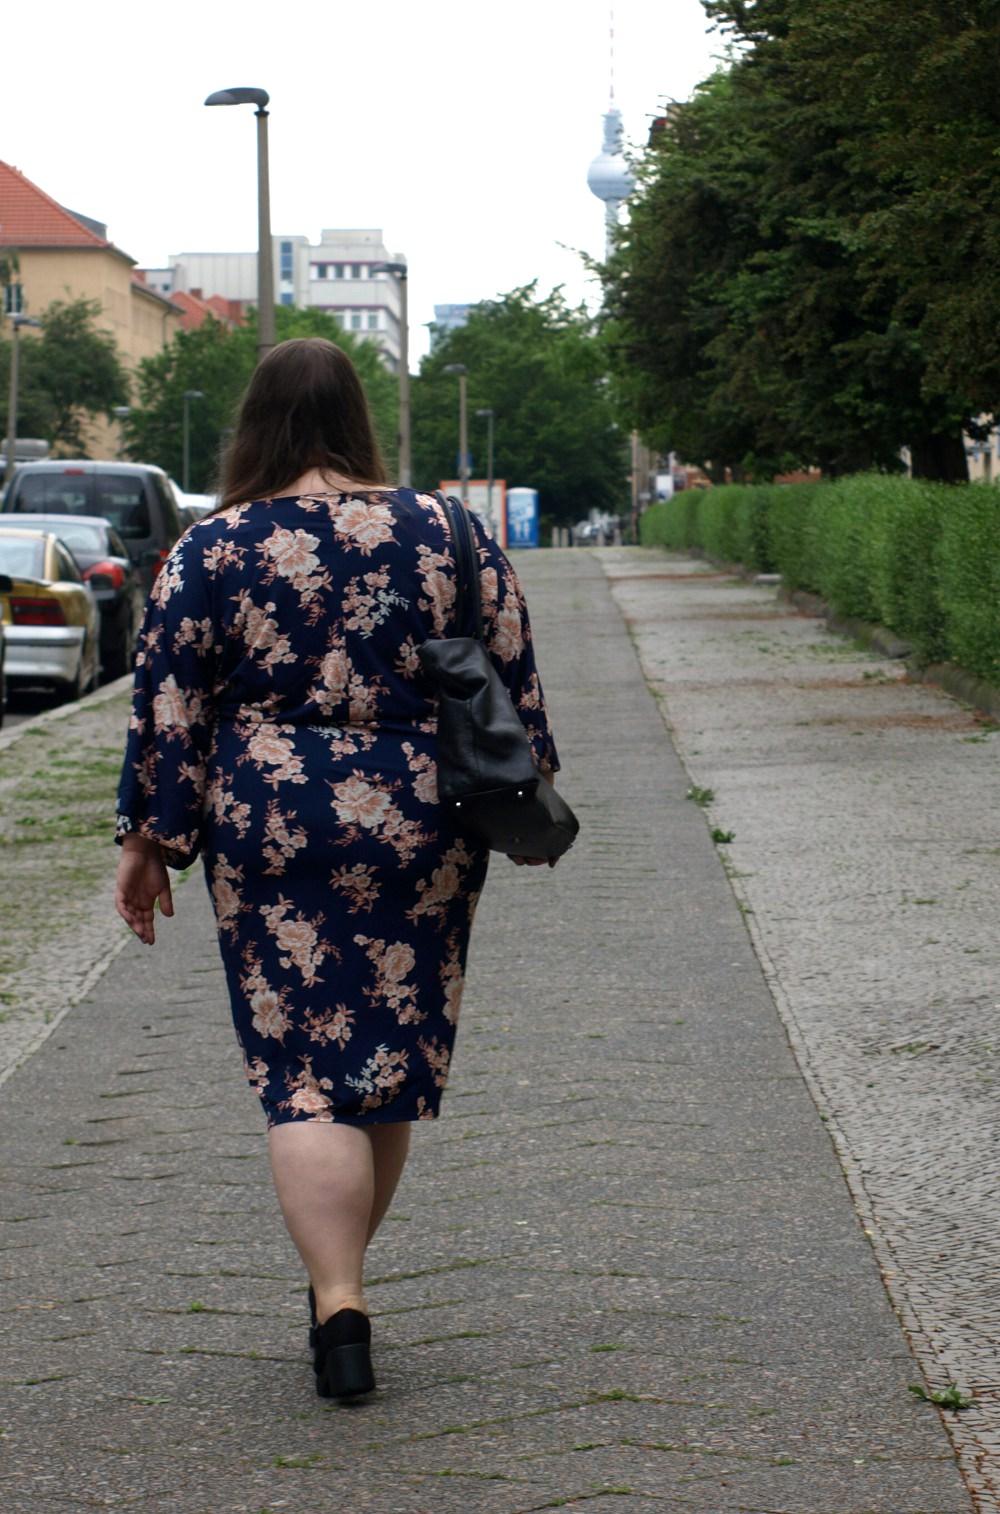 Katrinski in blauem Plus Size Kimonokleid mit Blumen